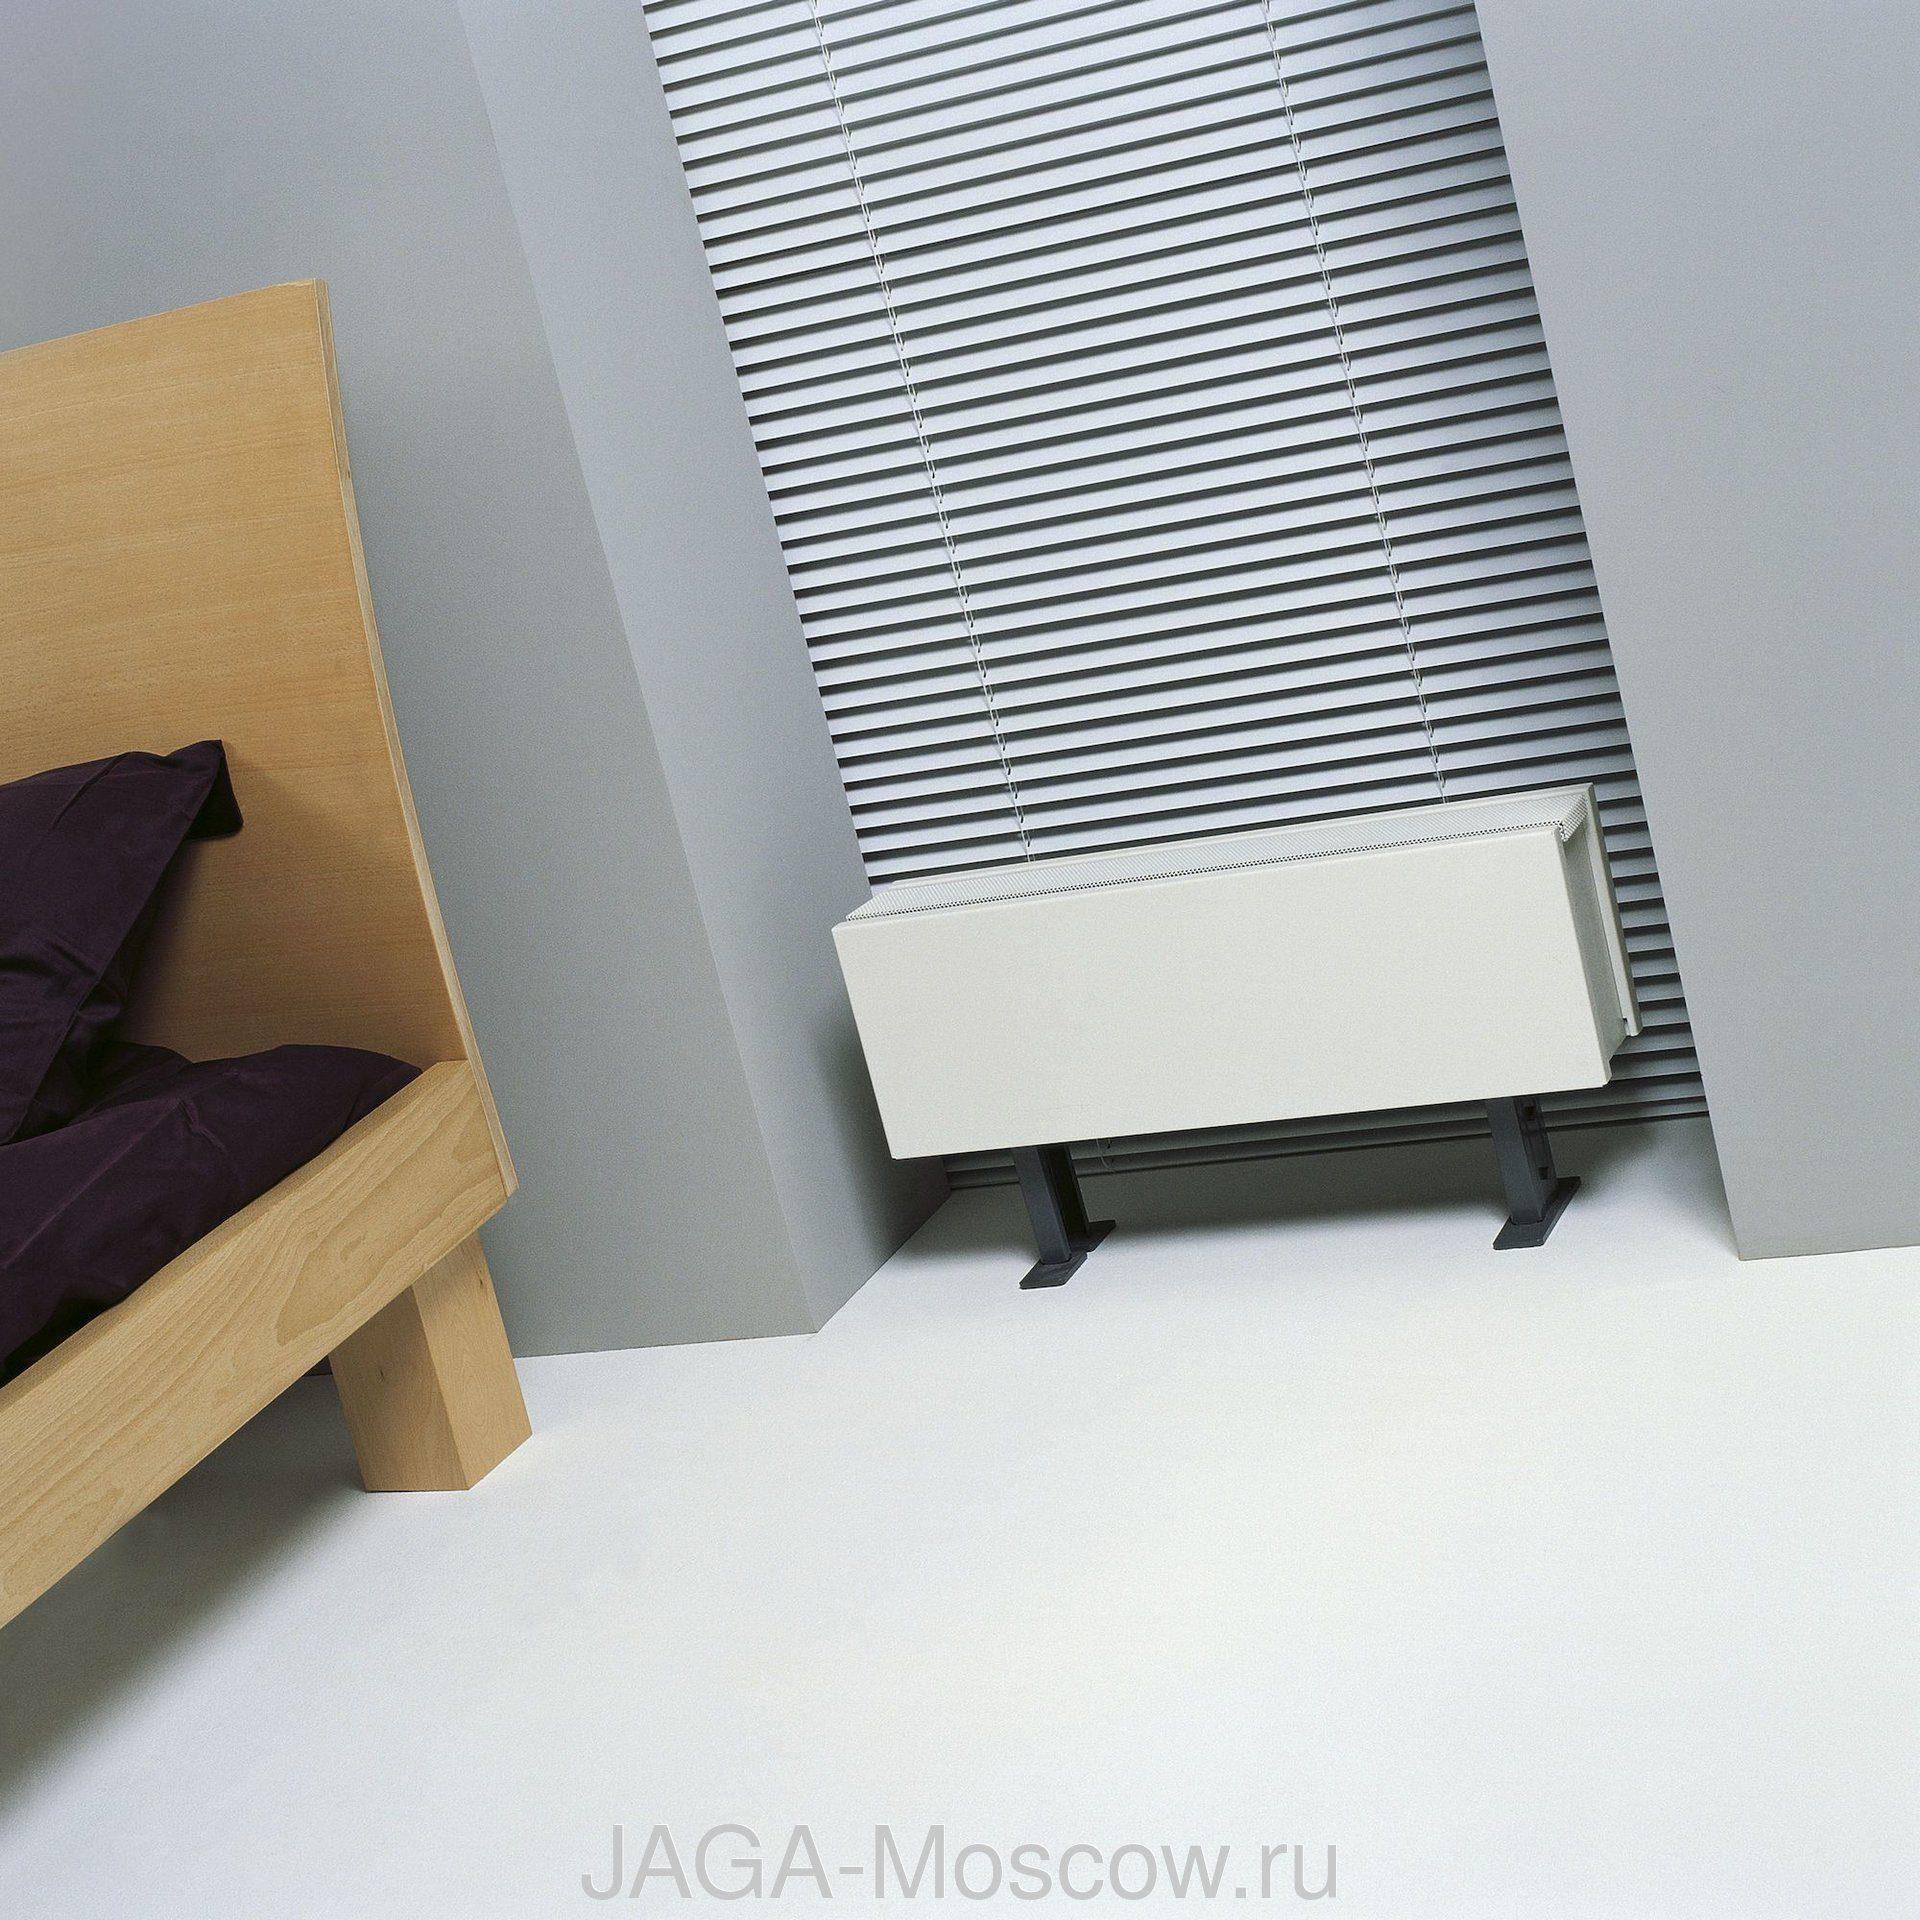 Электрические конвекторы - каталог